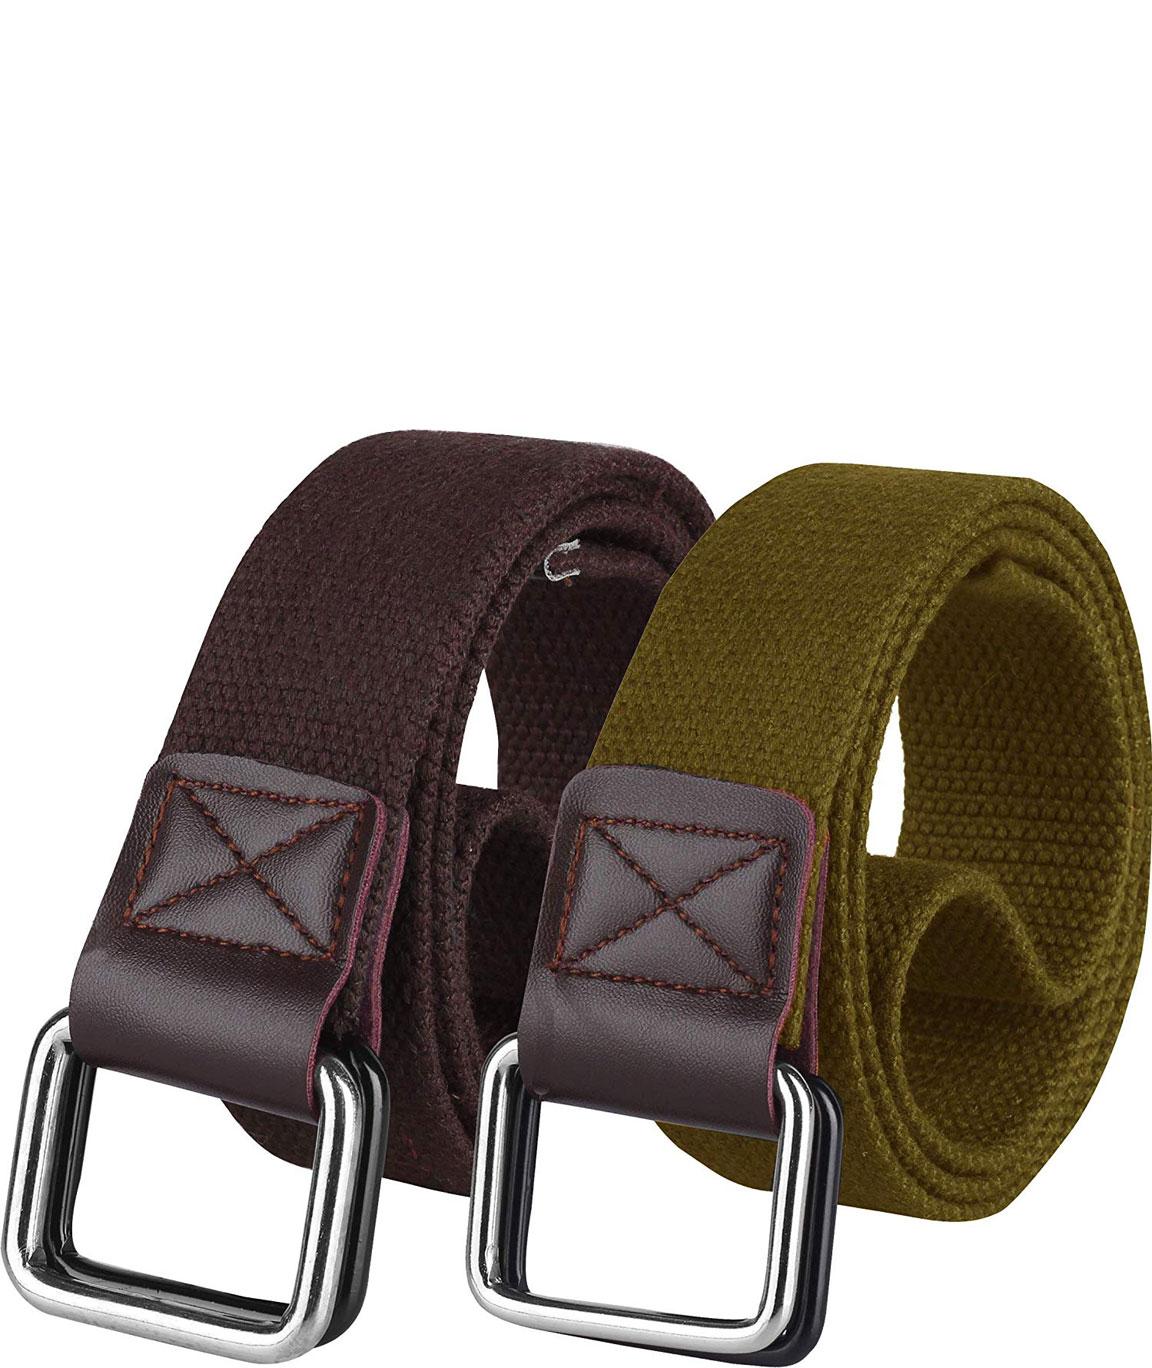 ZORO Cotton belt for men, belts for men under 200, gift for gents, belt for men stylish, gents belt, mens belt tan, blue, green, brown and khaki color CB40-40-2PC